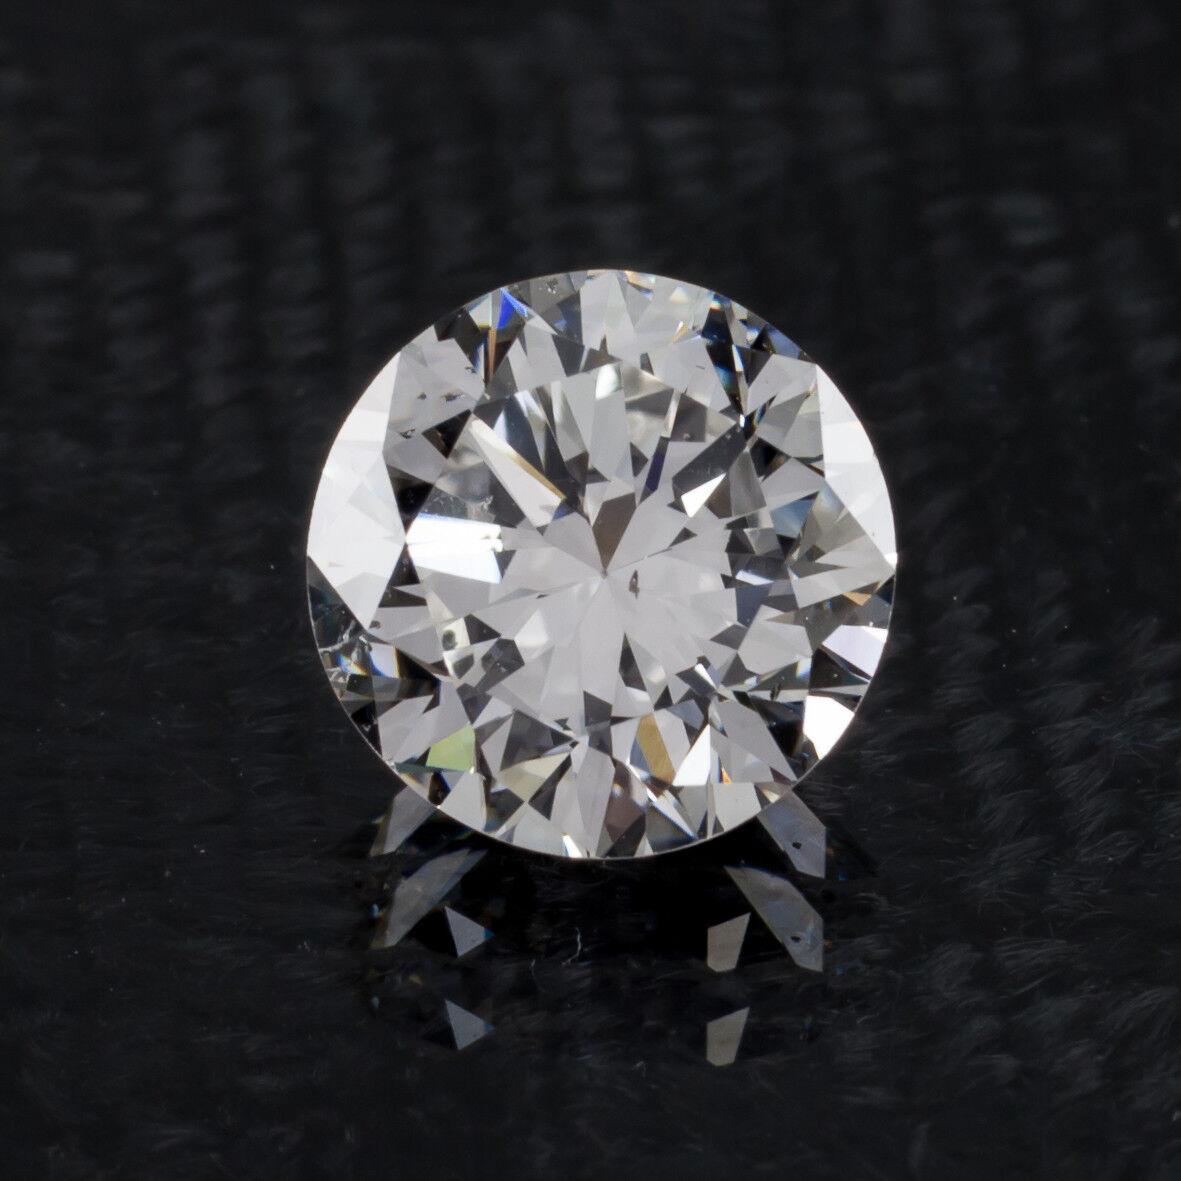 1.61 Carat Loose G / SI1 Round Brilliant Cut Diamond GIA Certified